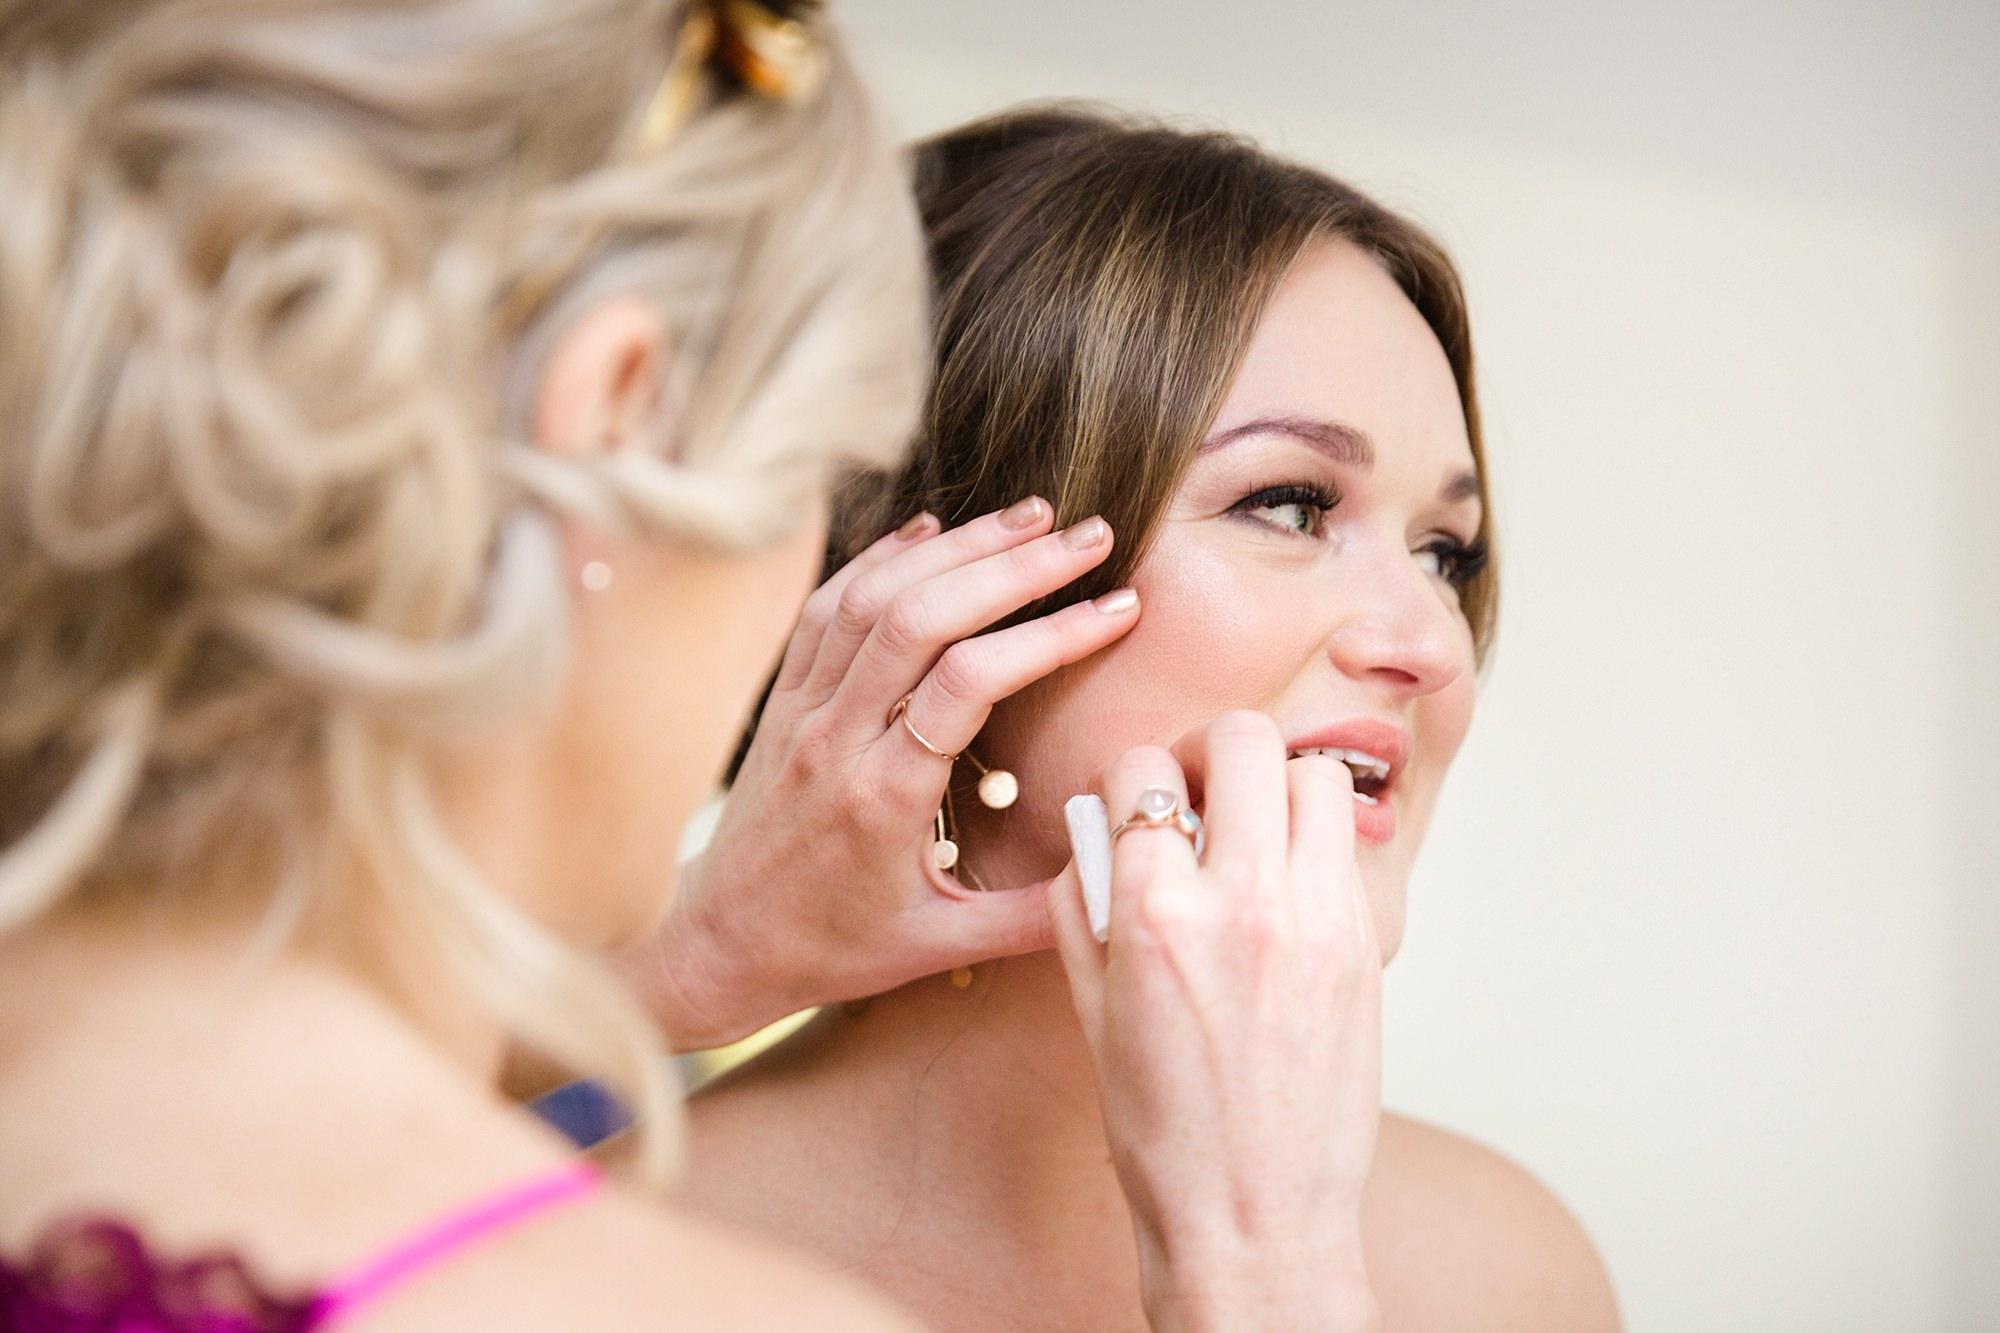 Fun London Wedding bridesmaid wipes lipstick kiss off bride's cheek